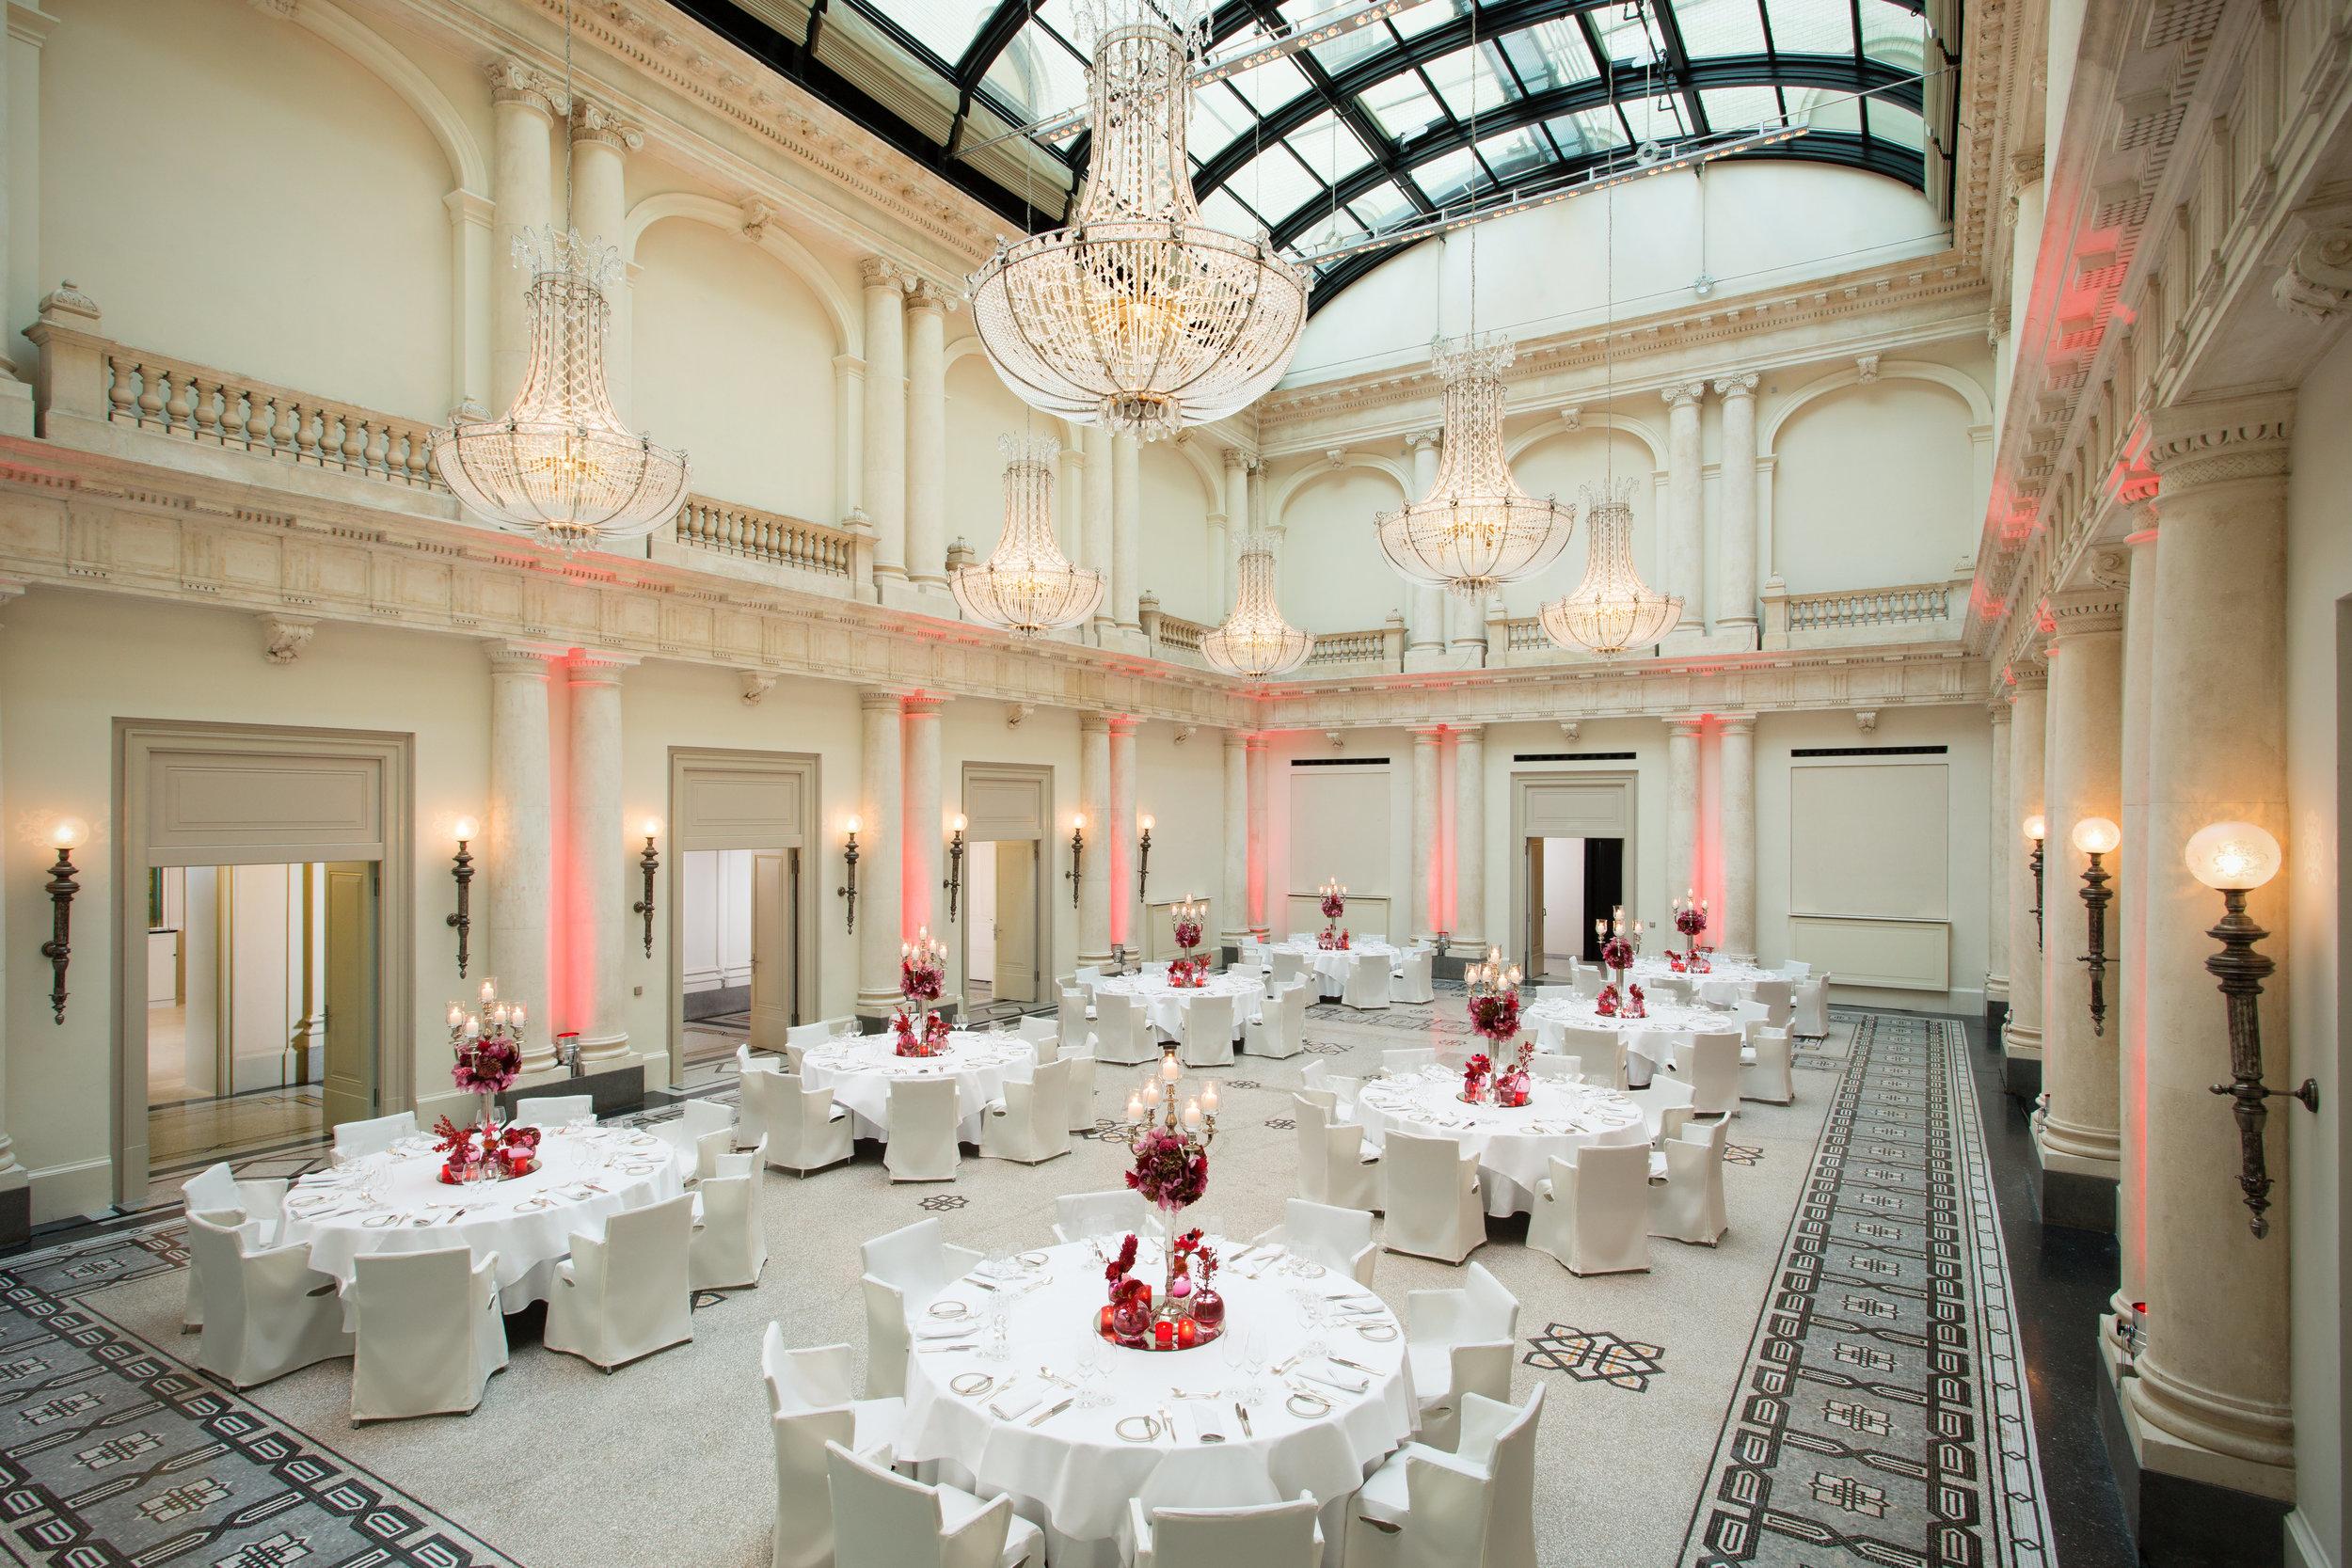 16 RFH Hotel de Rome - Ballroom.jpg